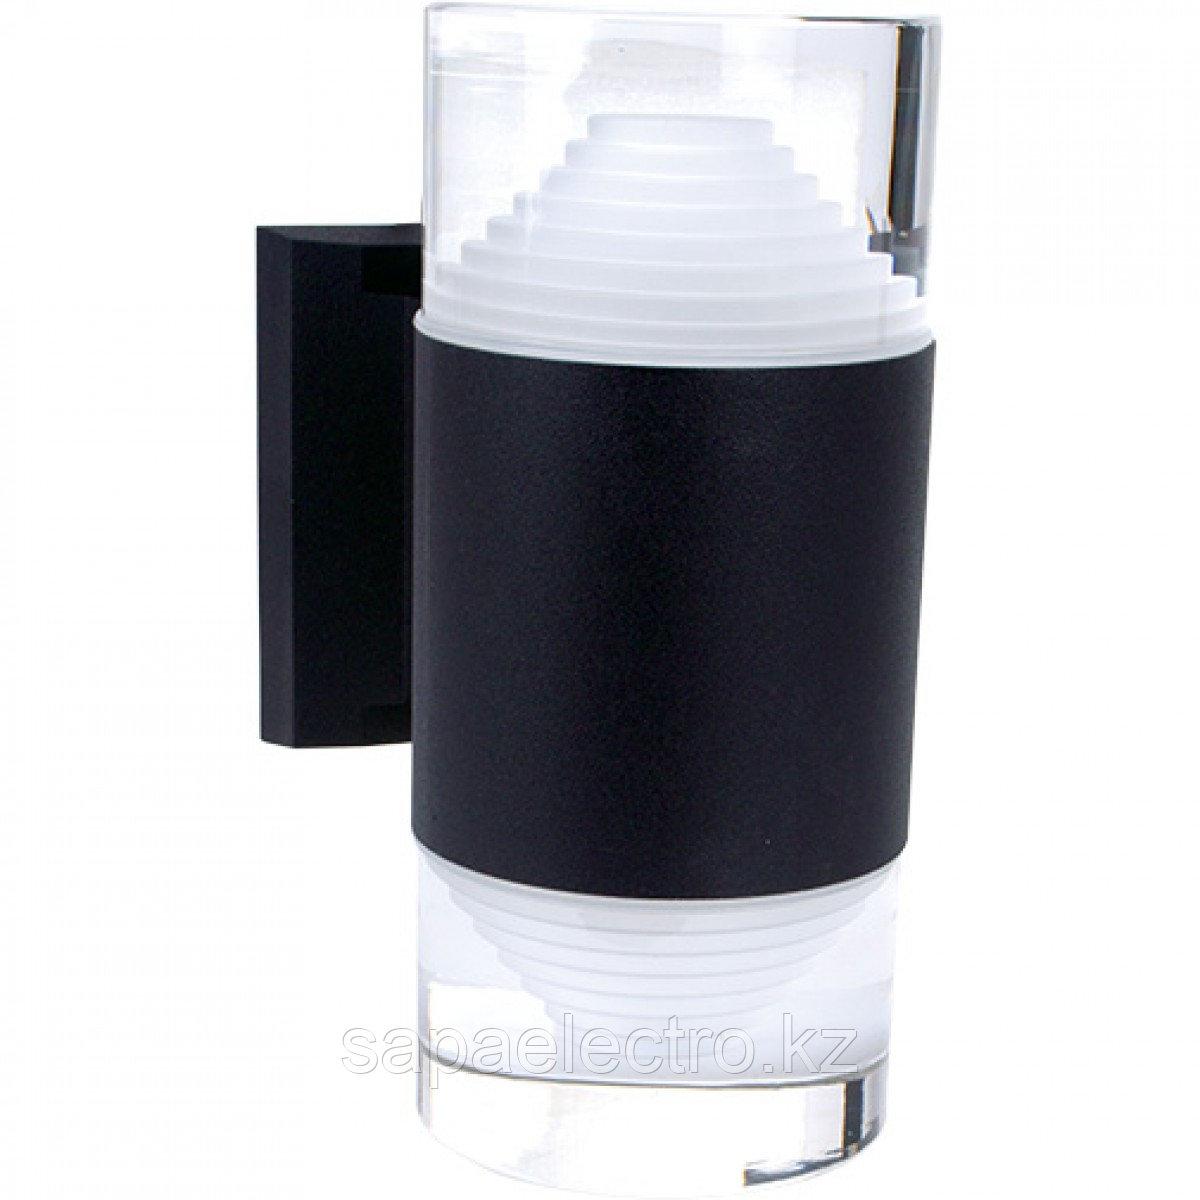 Свет-к LED  B2168 2*5W Dark Grey 4000K  (TS) 10шт